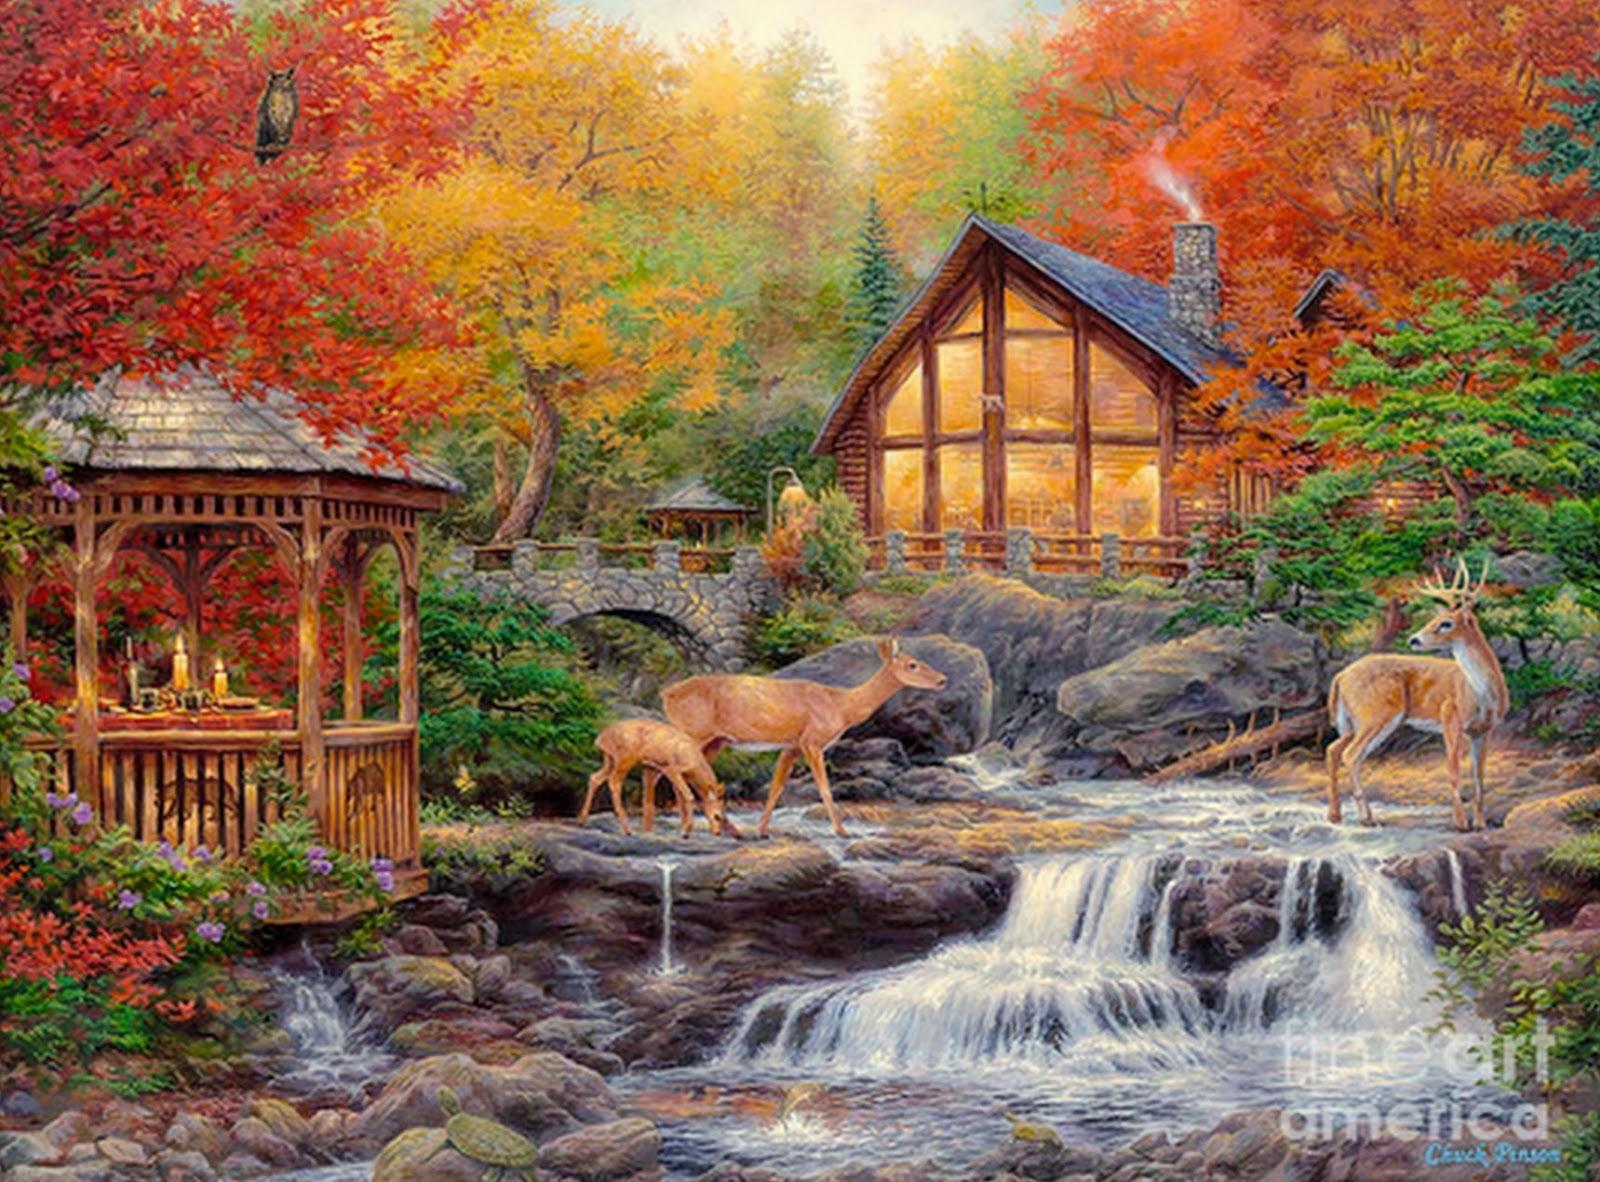 Cuadros modernos pinturas y dibujos hermosos paisajes al for Americas best paint